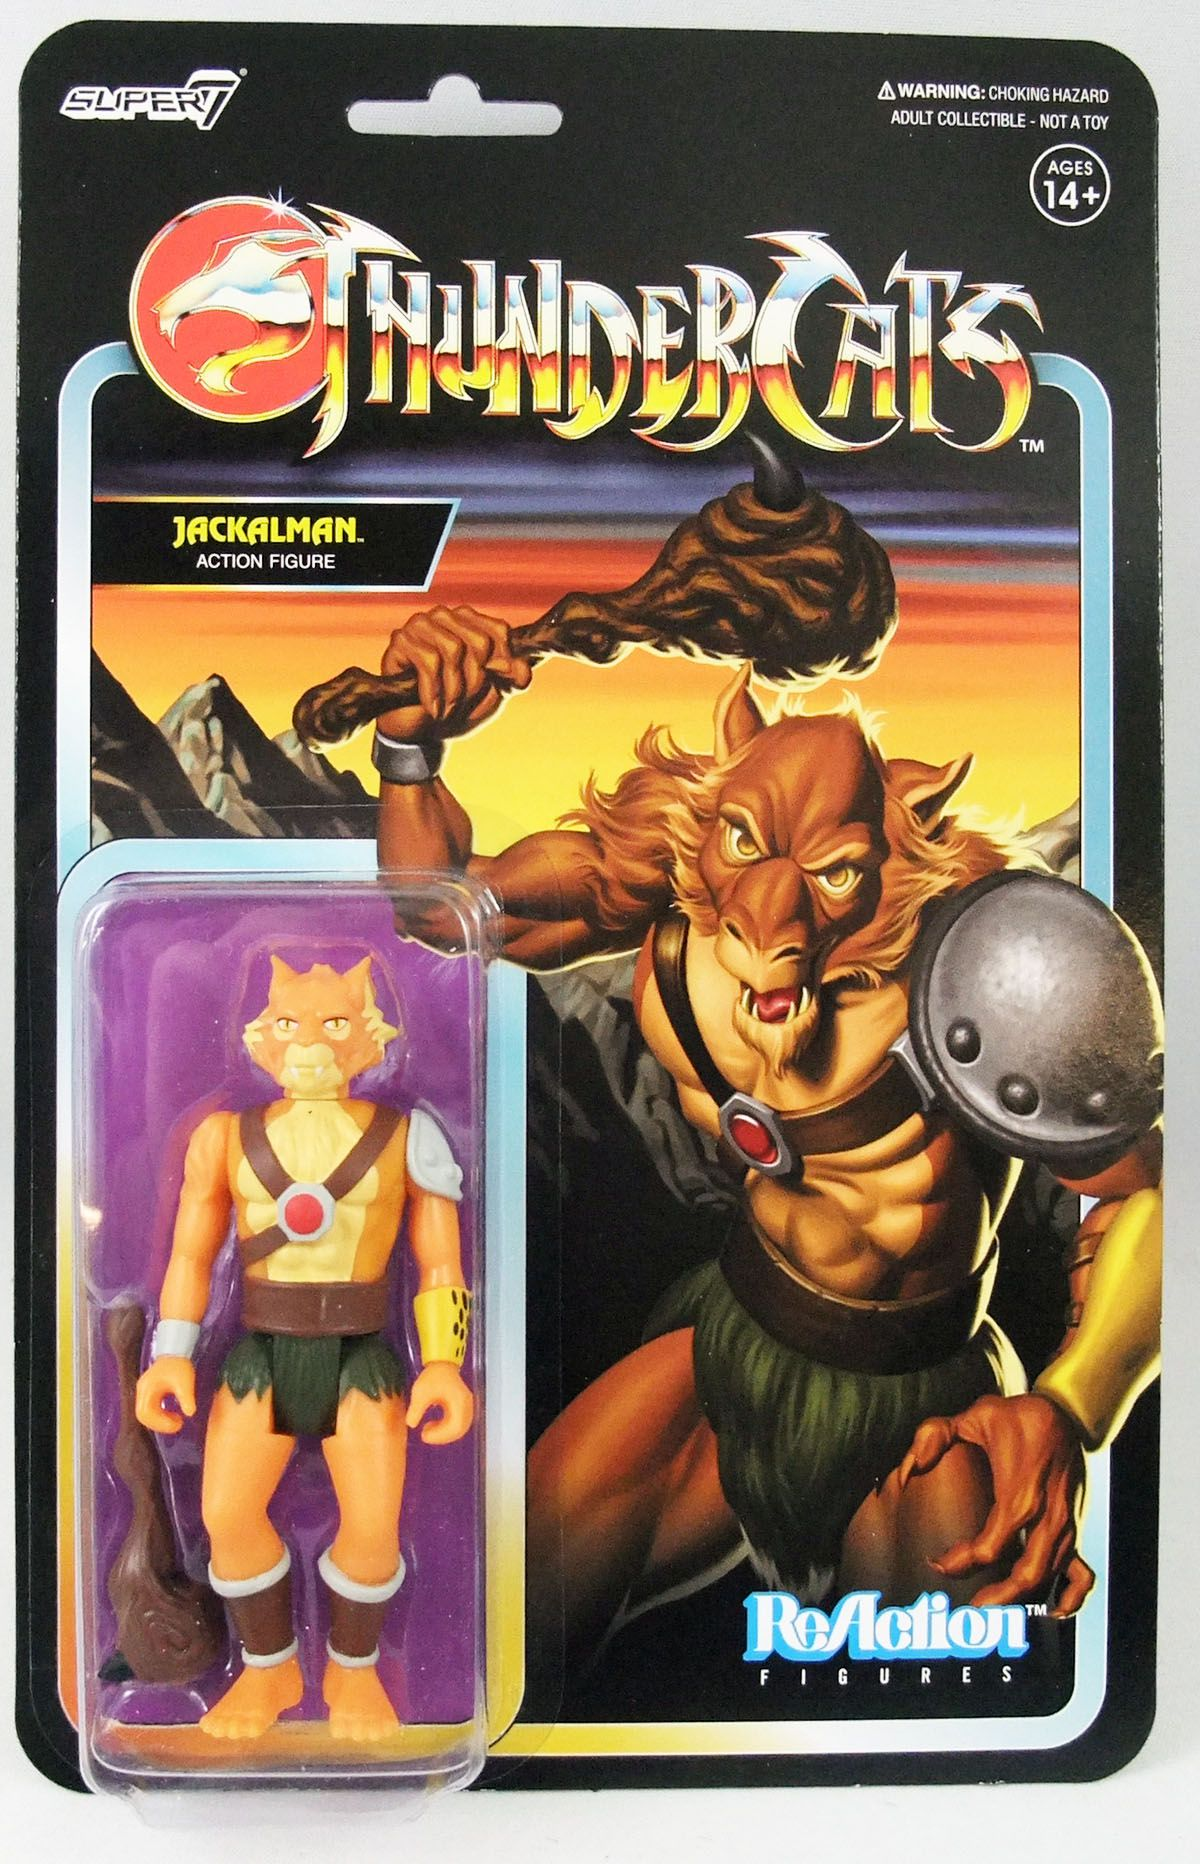 Thundercats - Super7 ReAction Figures - Jackalman